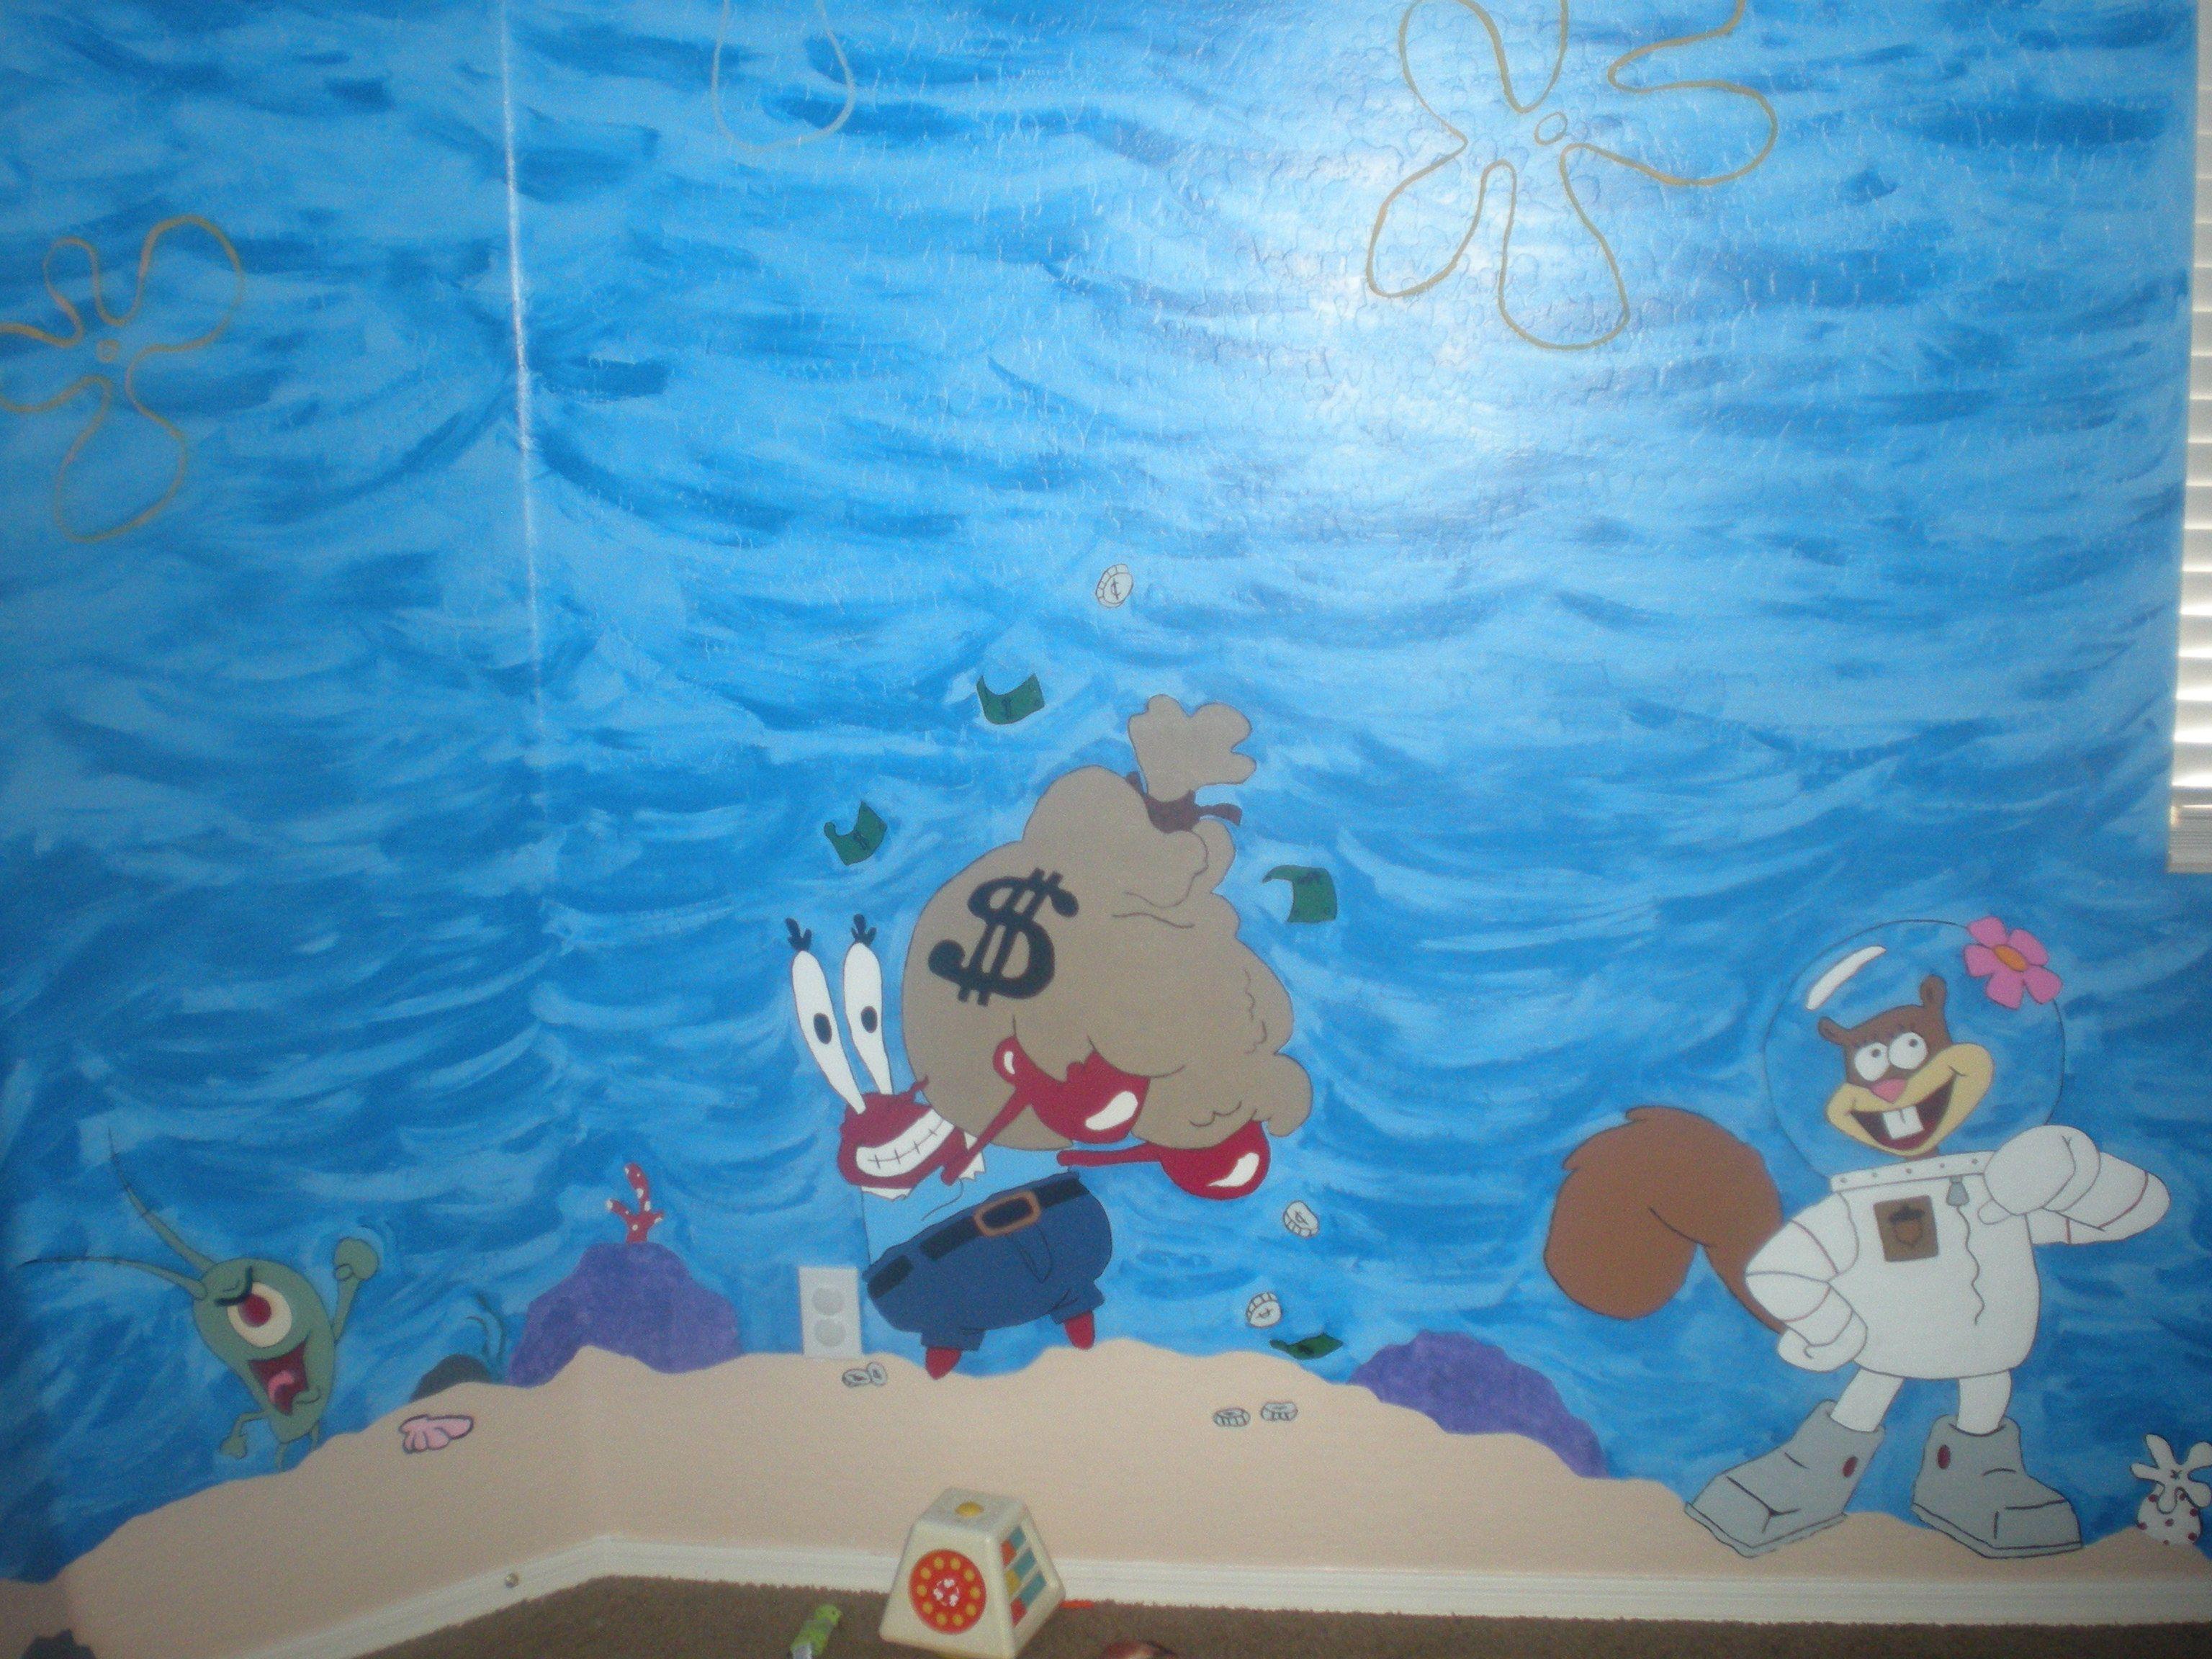 spongebob room  My creations  Pinterest